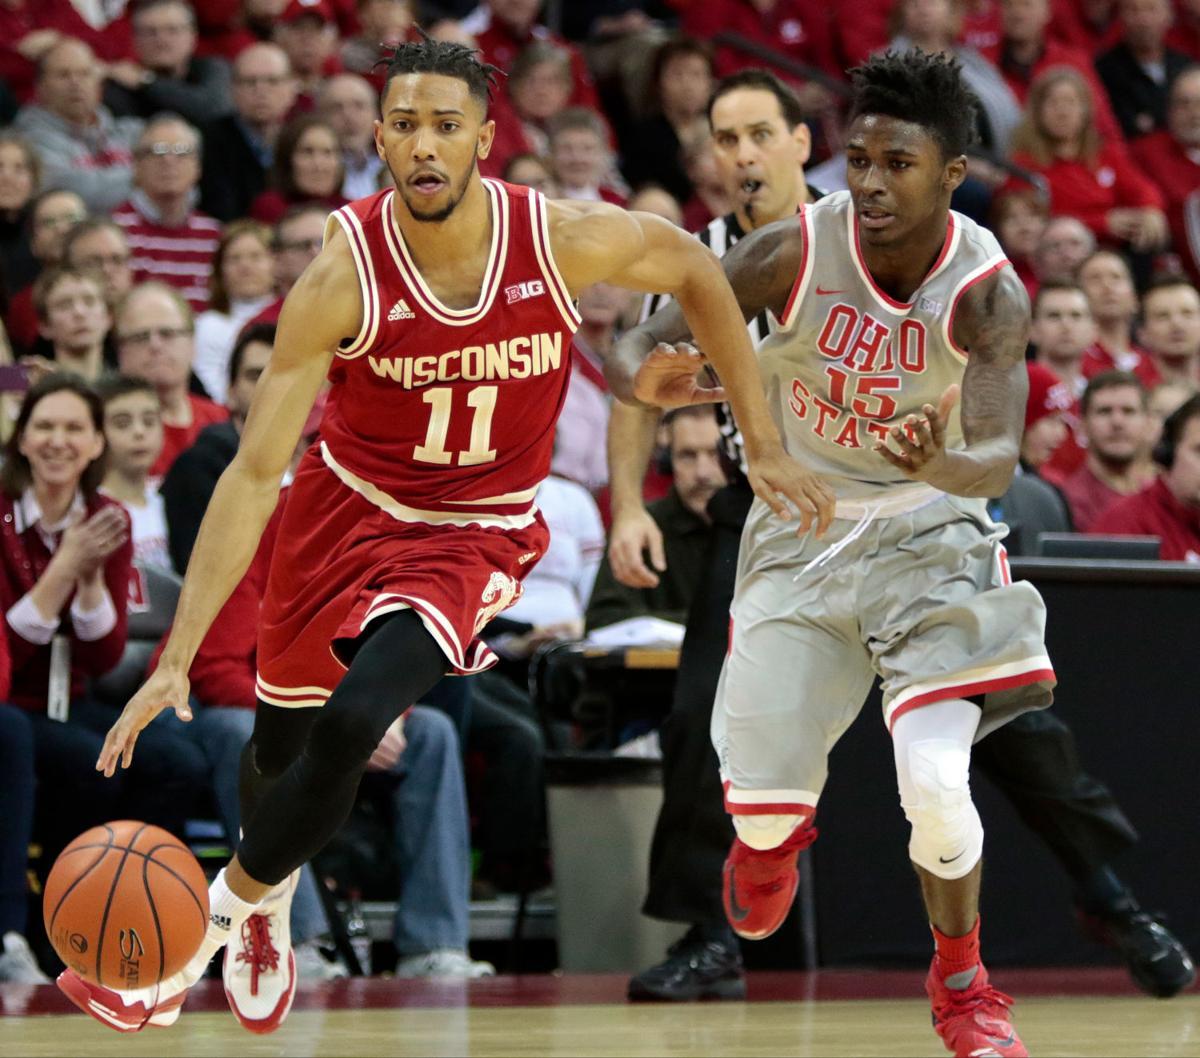 Badgers men's basketball: Winding roads converge again for ex-teammates Jordan Hill, Duncan ...